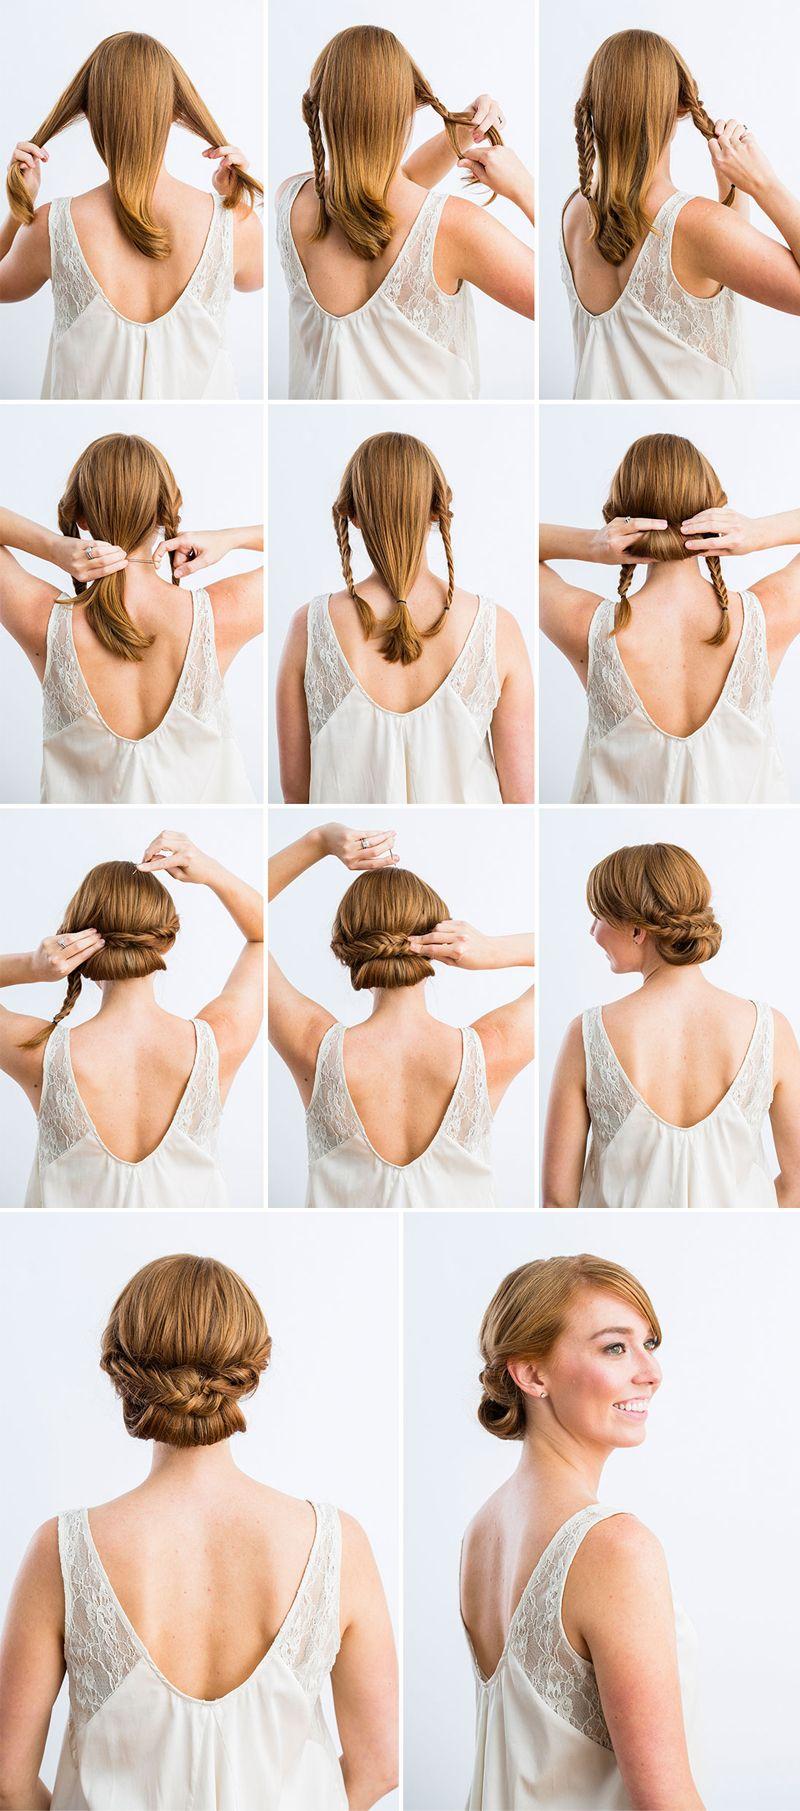 diy ponytail haircut for medium length hair 10 best diy wedding hairstyles with tutorials diy